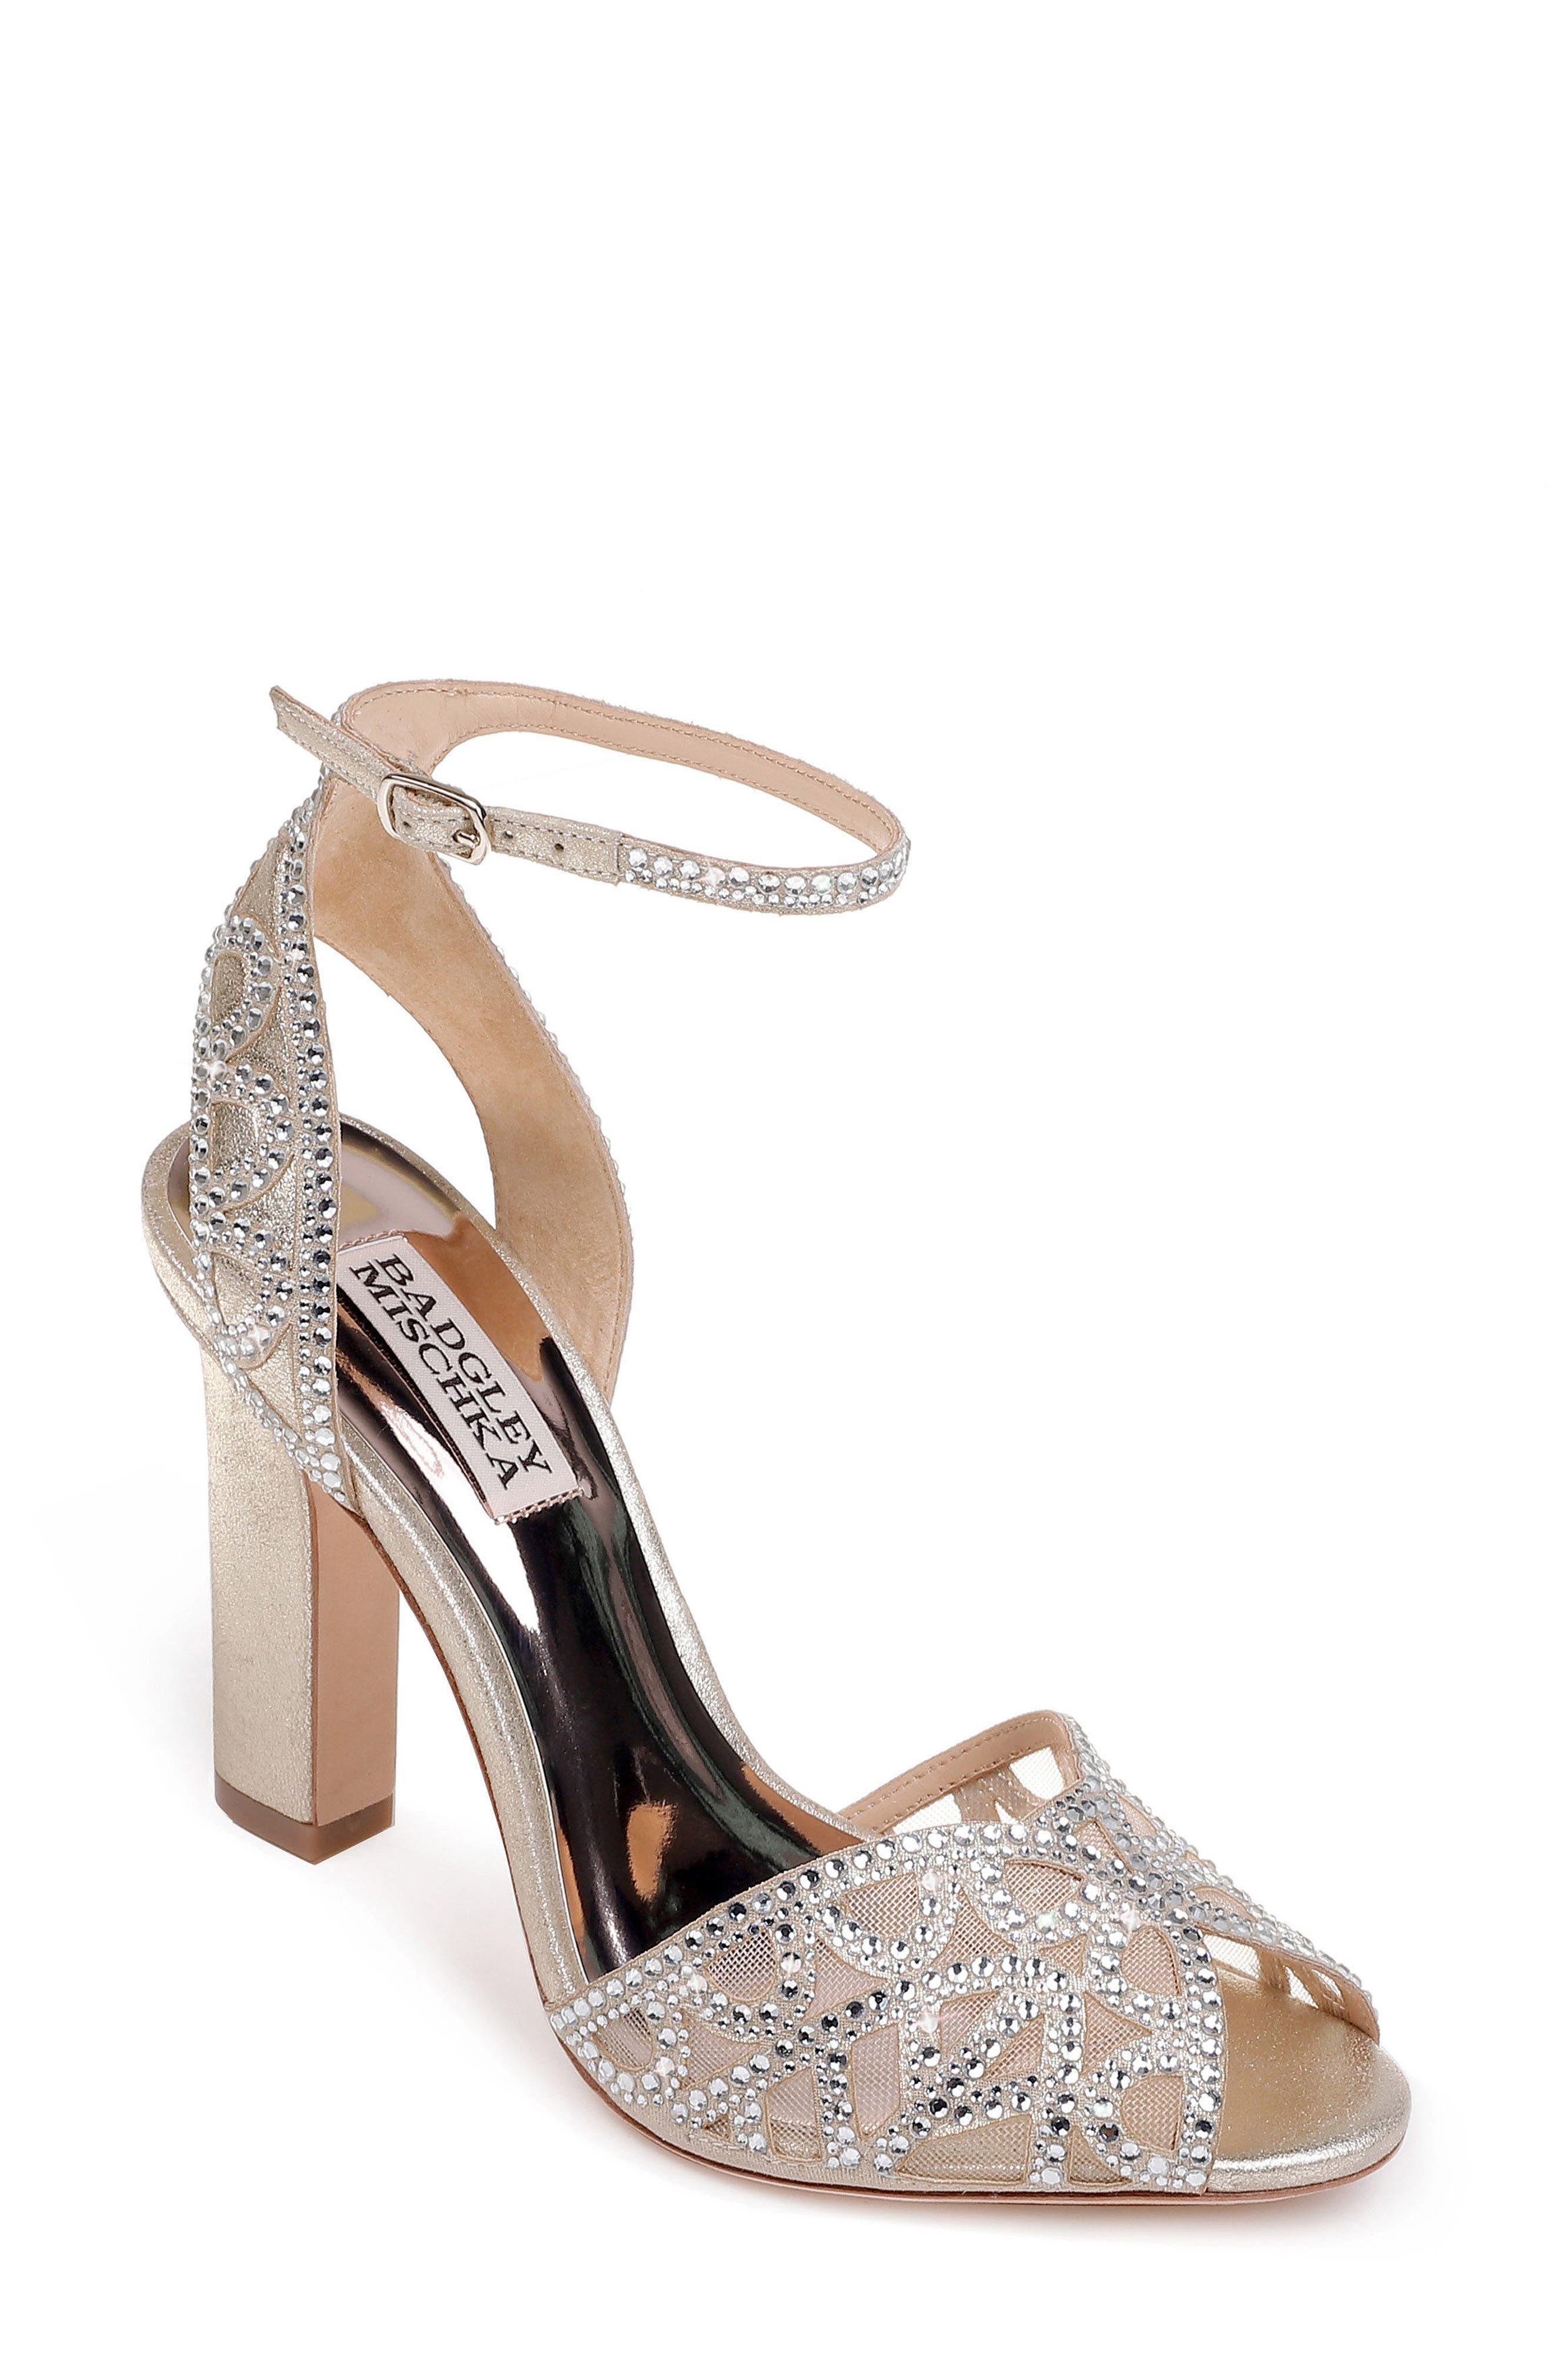 Badgley Mischka Hart Crystal Embellished Sandal,                             Main thumbnail 1, color,                             040